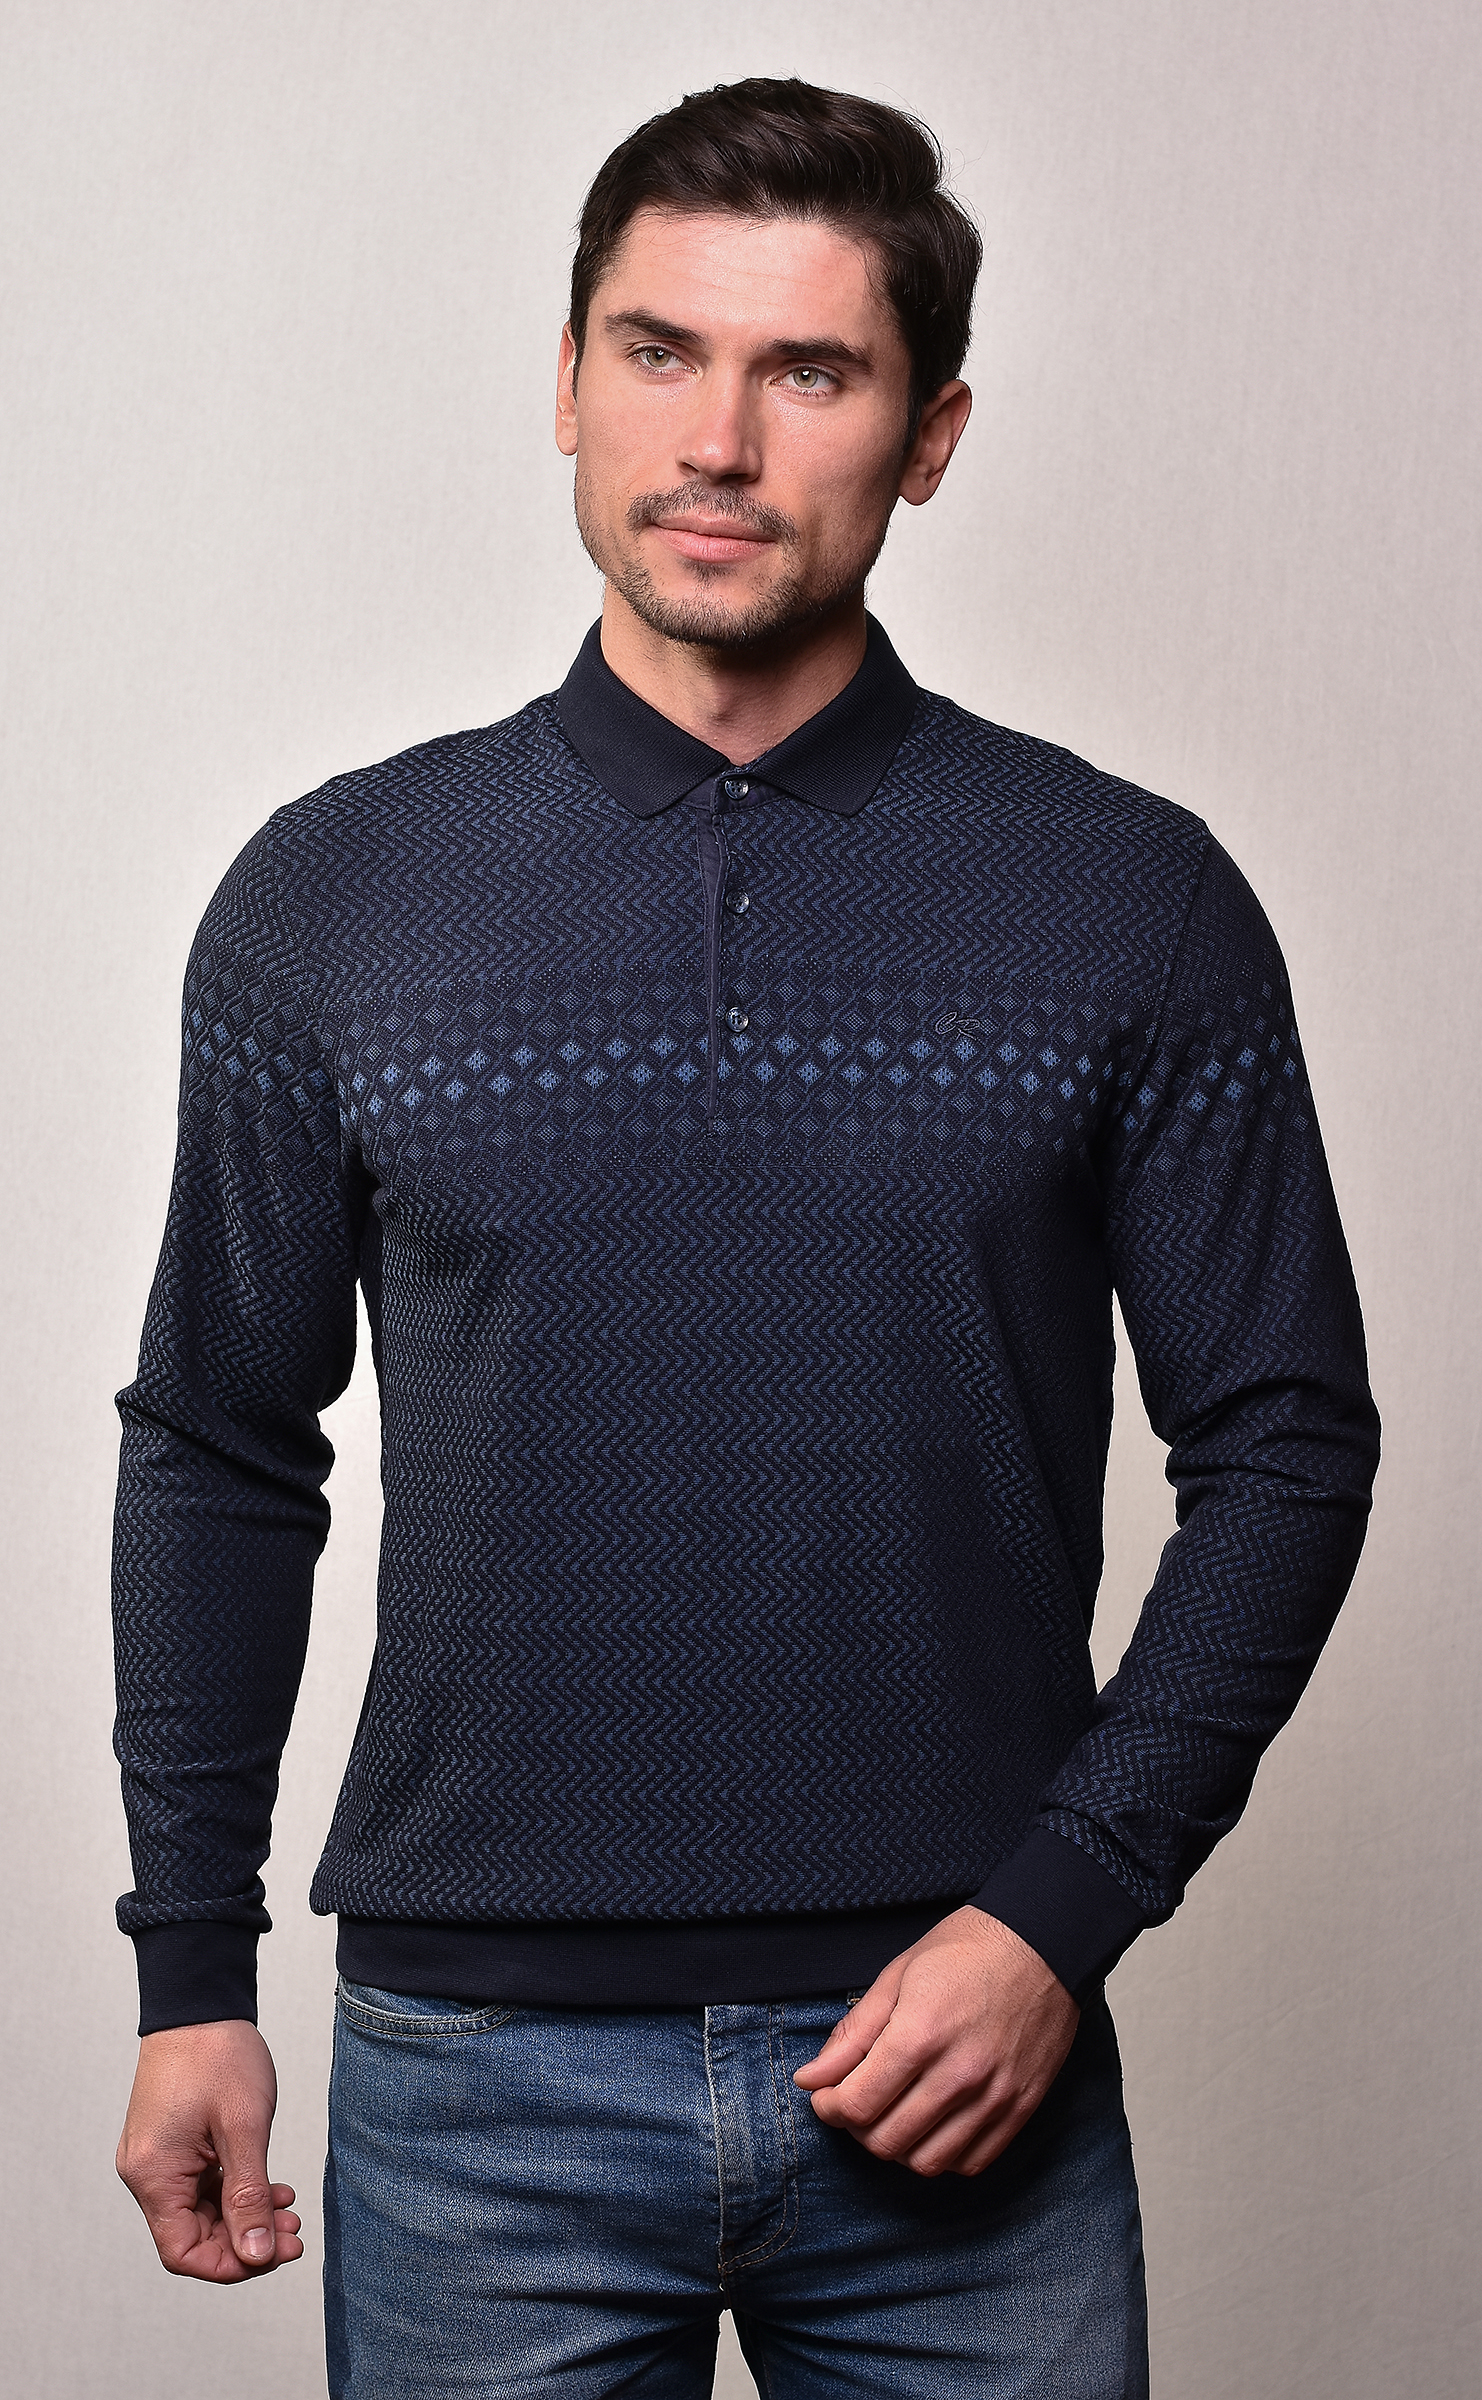 Рубашка поло Caporicco А. 9009 купить оптом в Москве